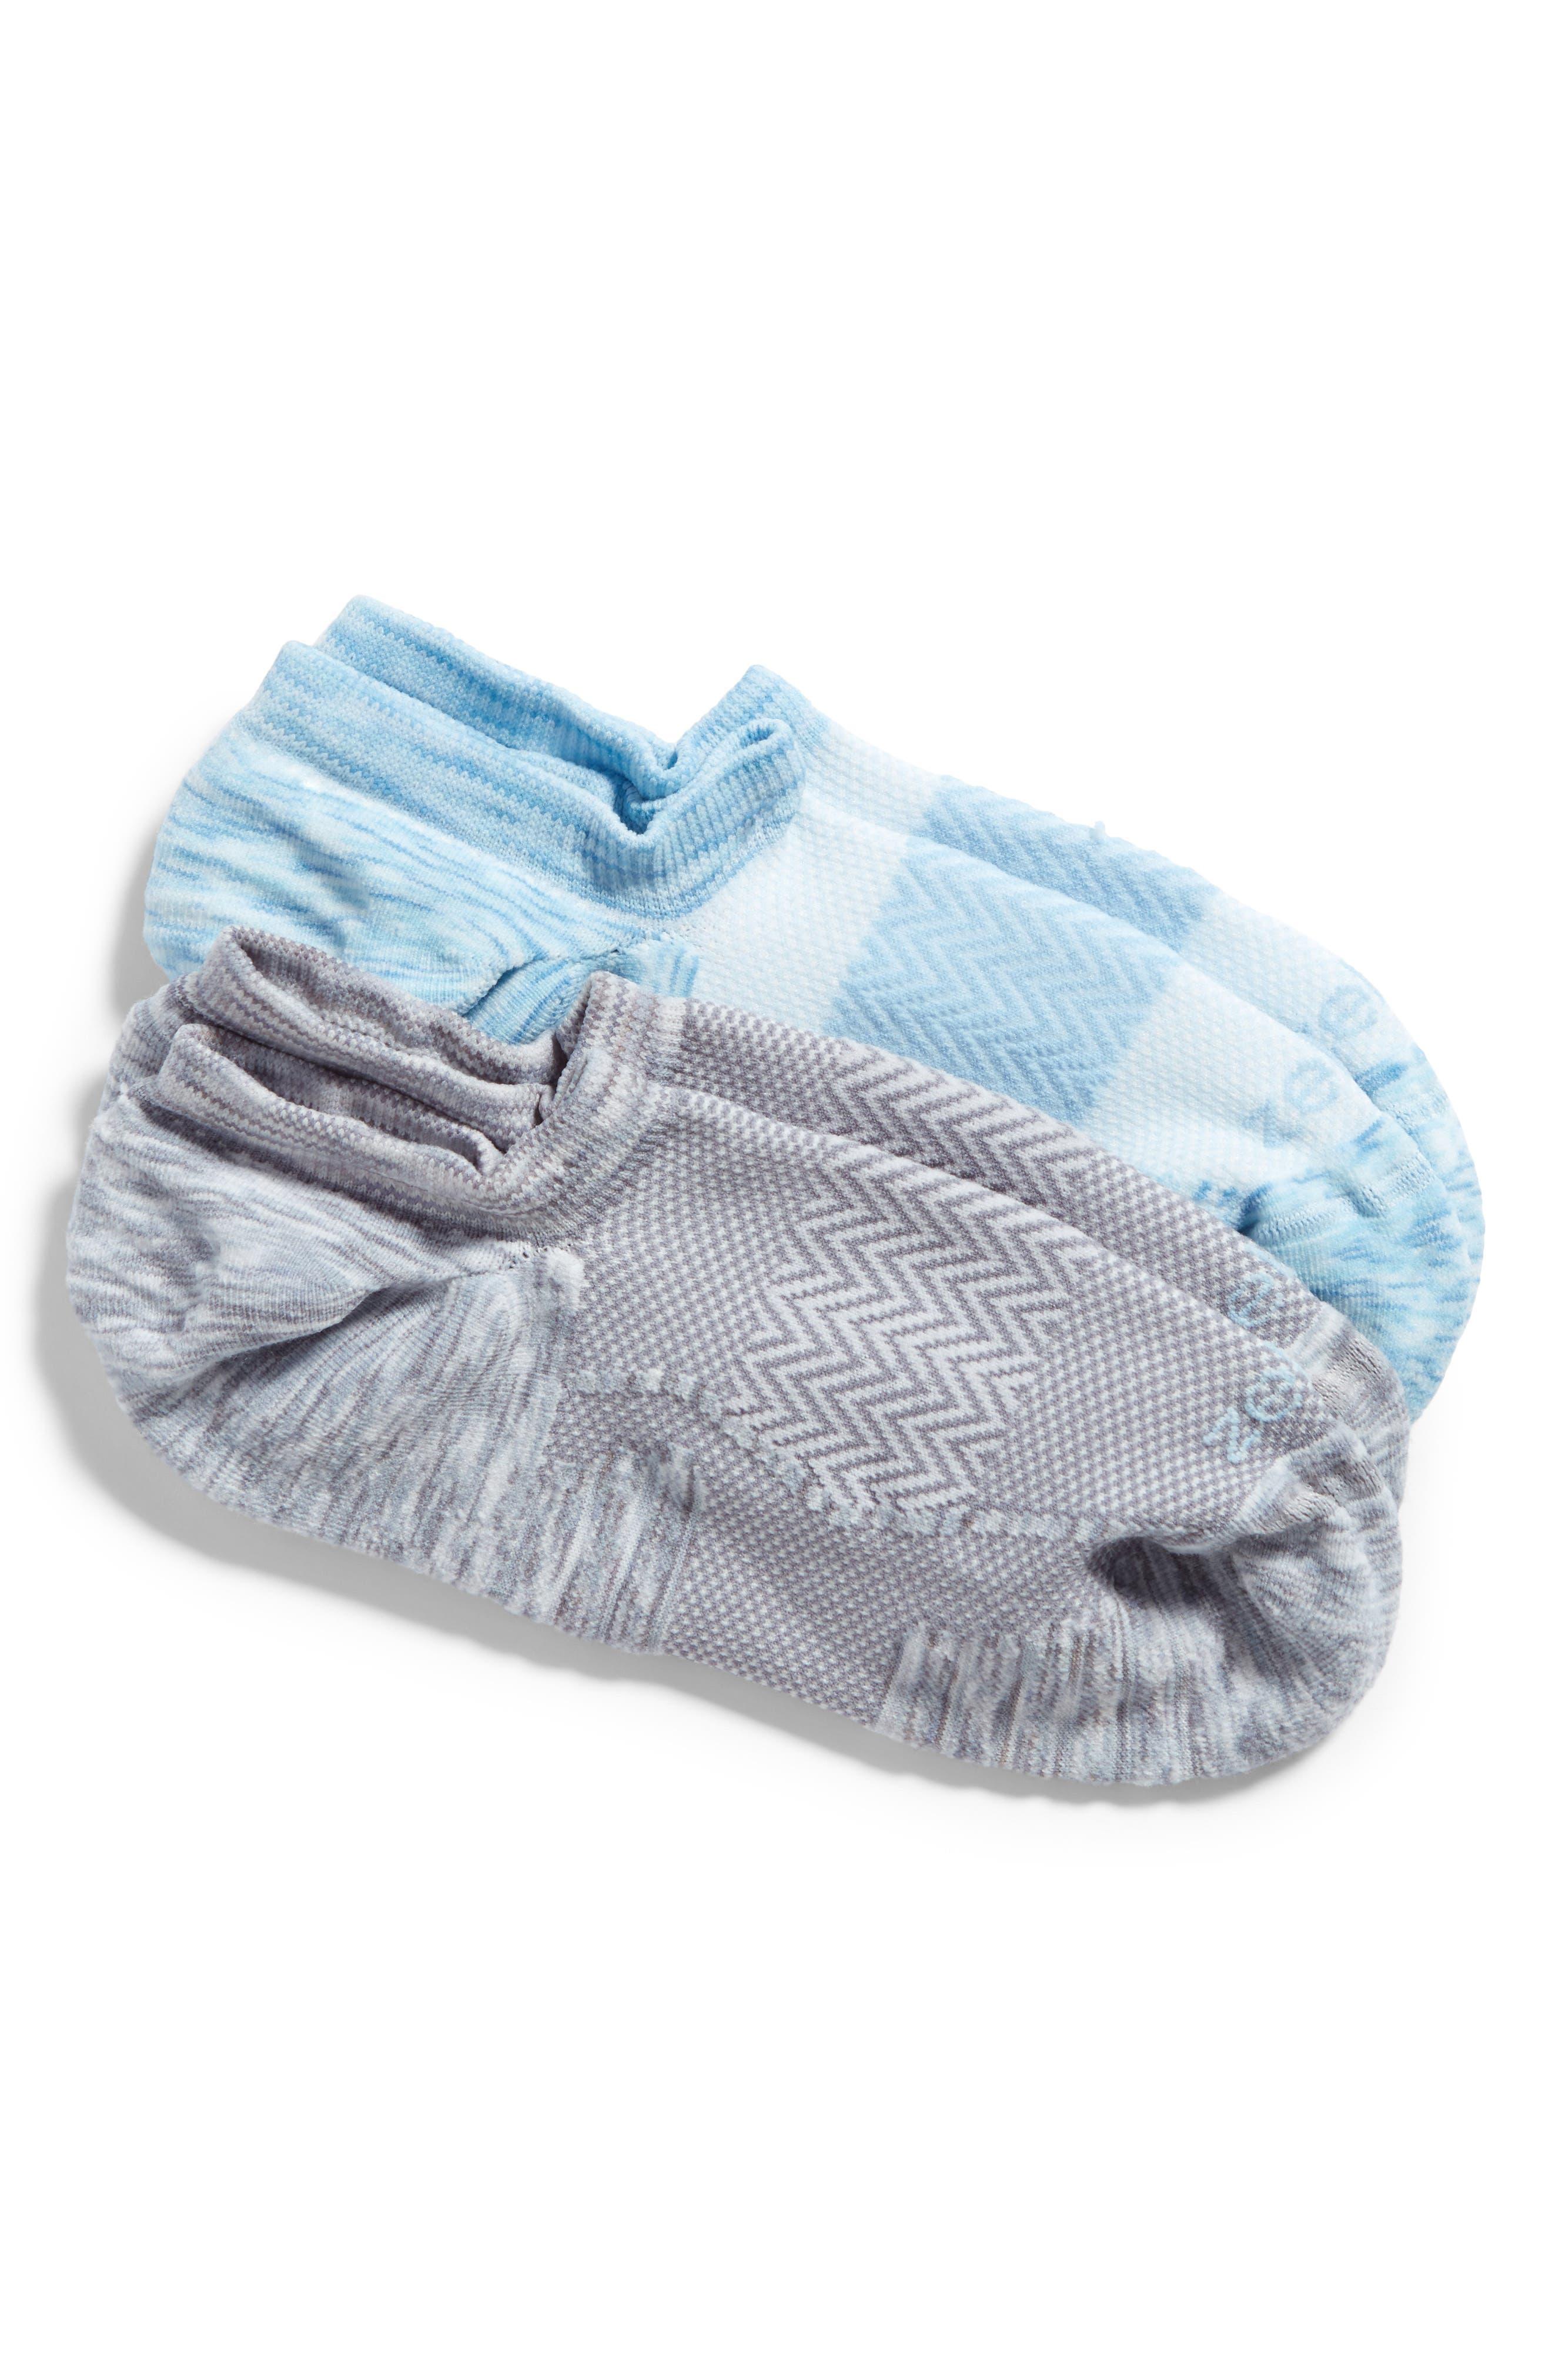 Main Image - Zella 2-Pack Cushioned Low-Cut Running Socks